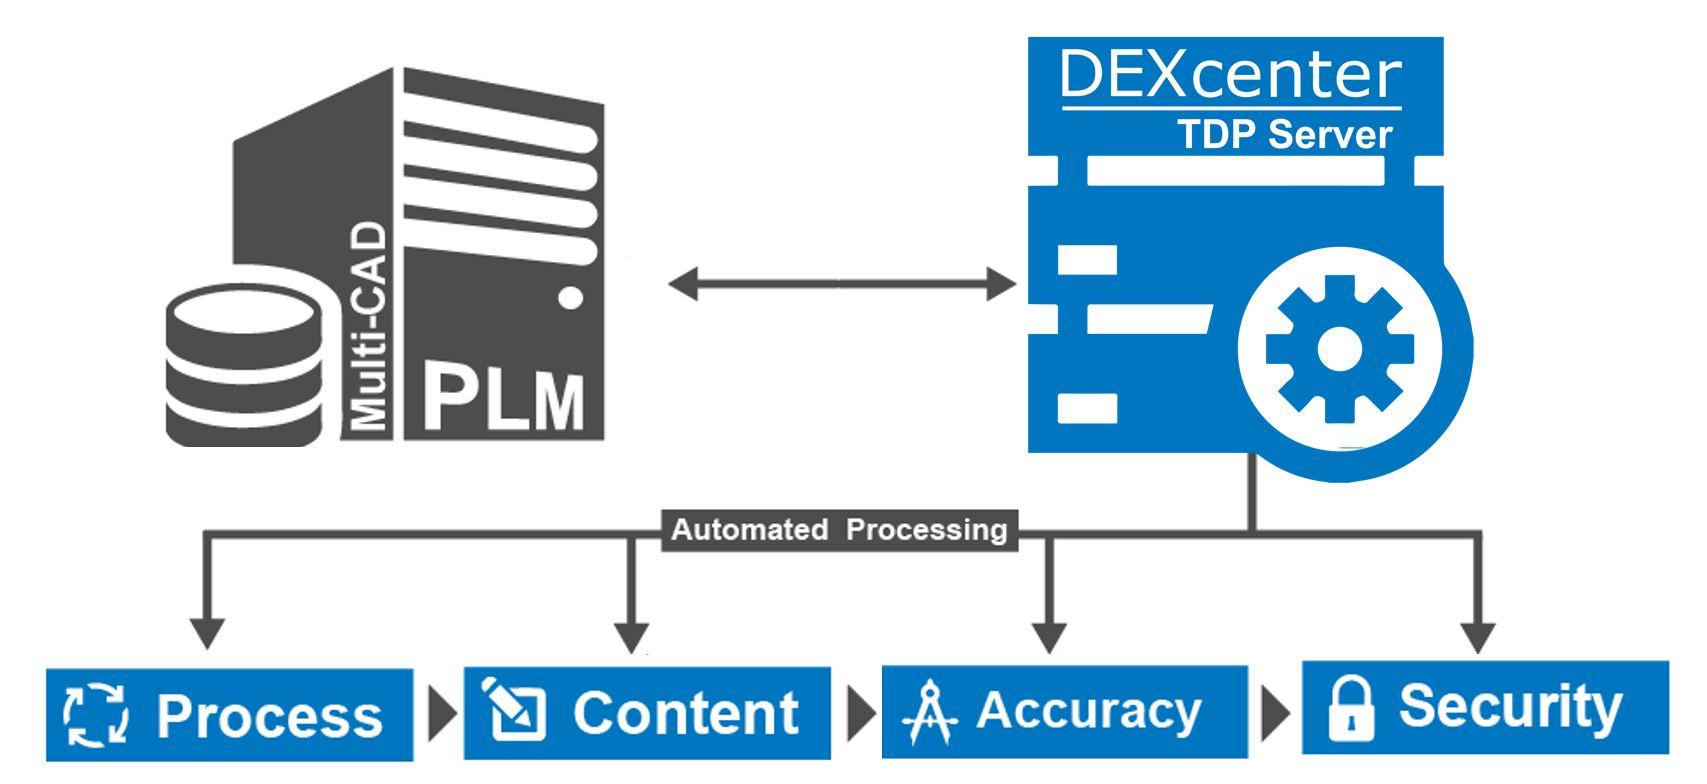 DEXcenter-TDP-Server.jpg